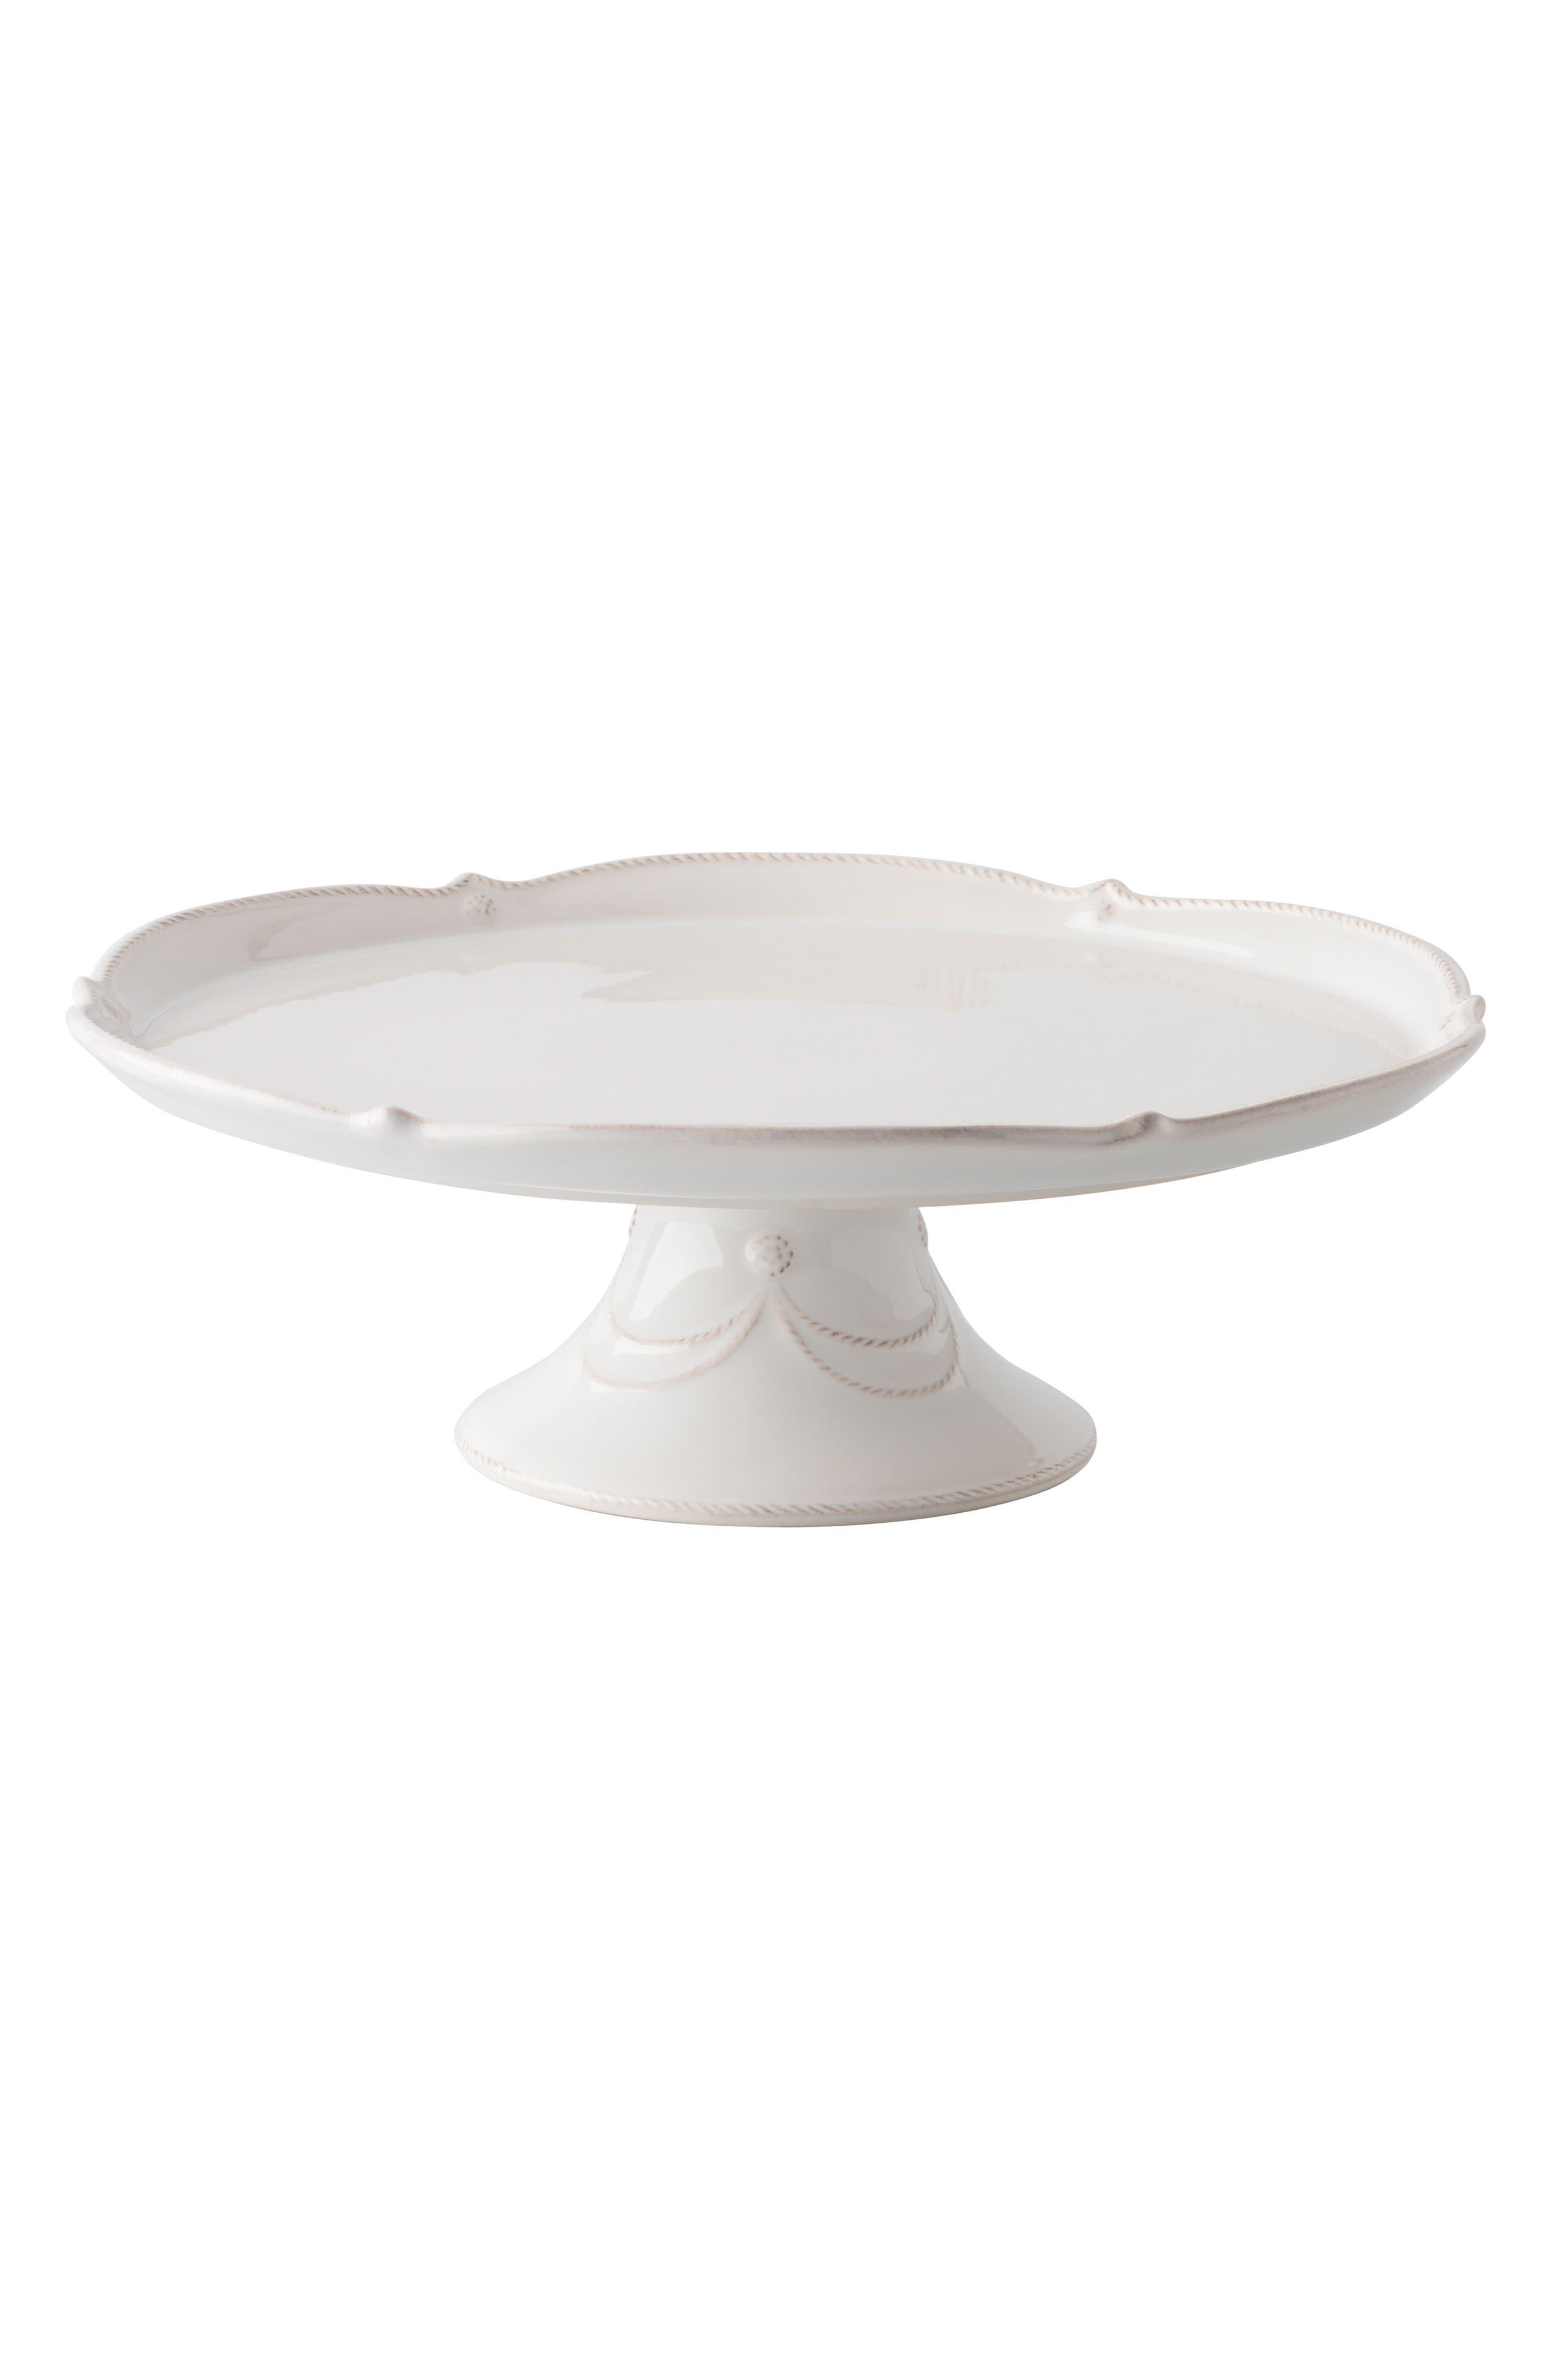 Juliska Berry & Thread Ceramic Cake Stand